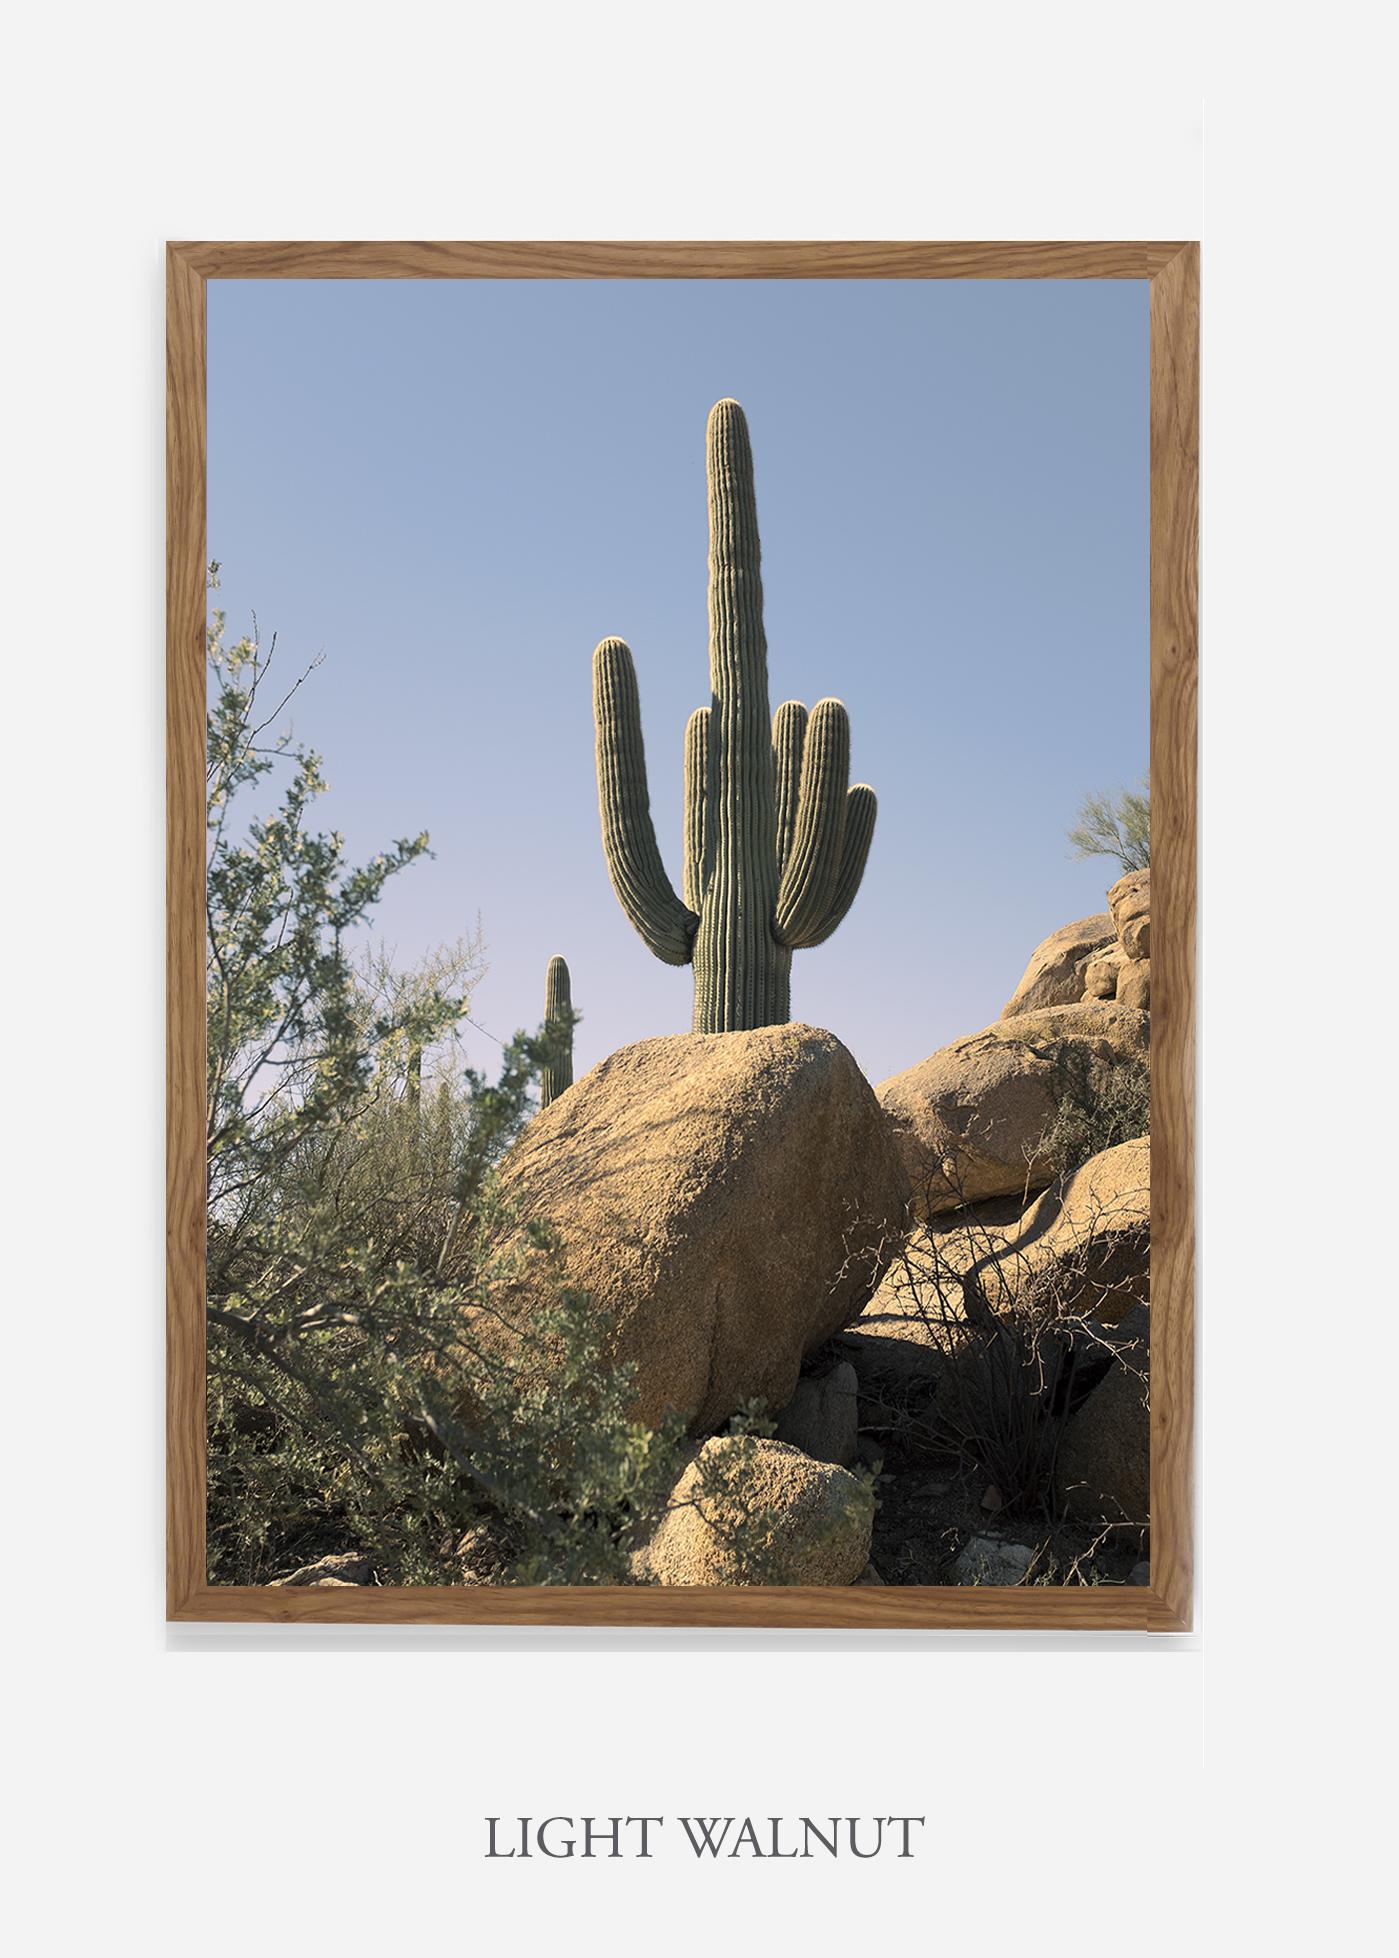 nomat-lightwalnutframe-saguaroNo.14-wildercalifornia-art-wallart-cactusprint-homedecor-prints-arizona-botanical-artwork-interiordesign.jpg